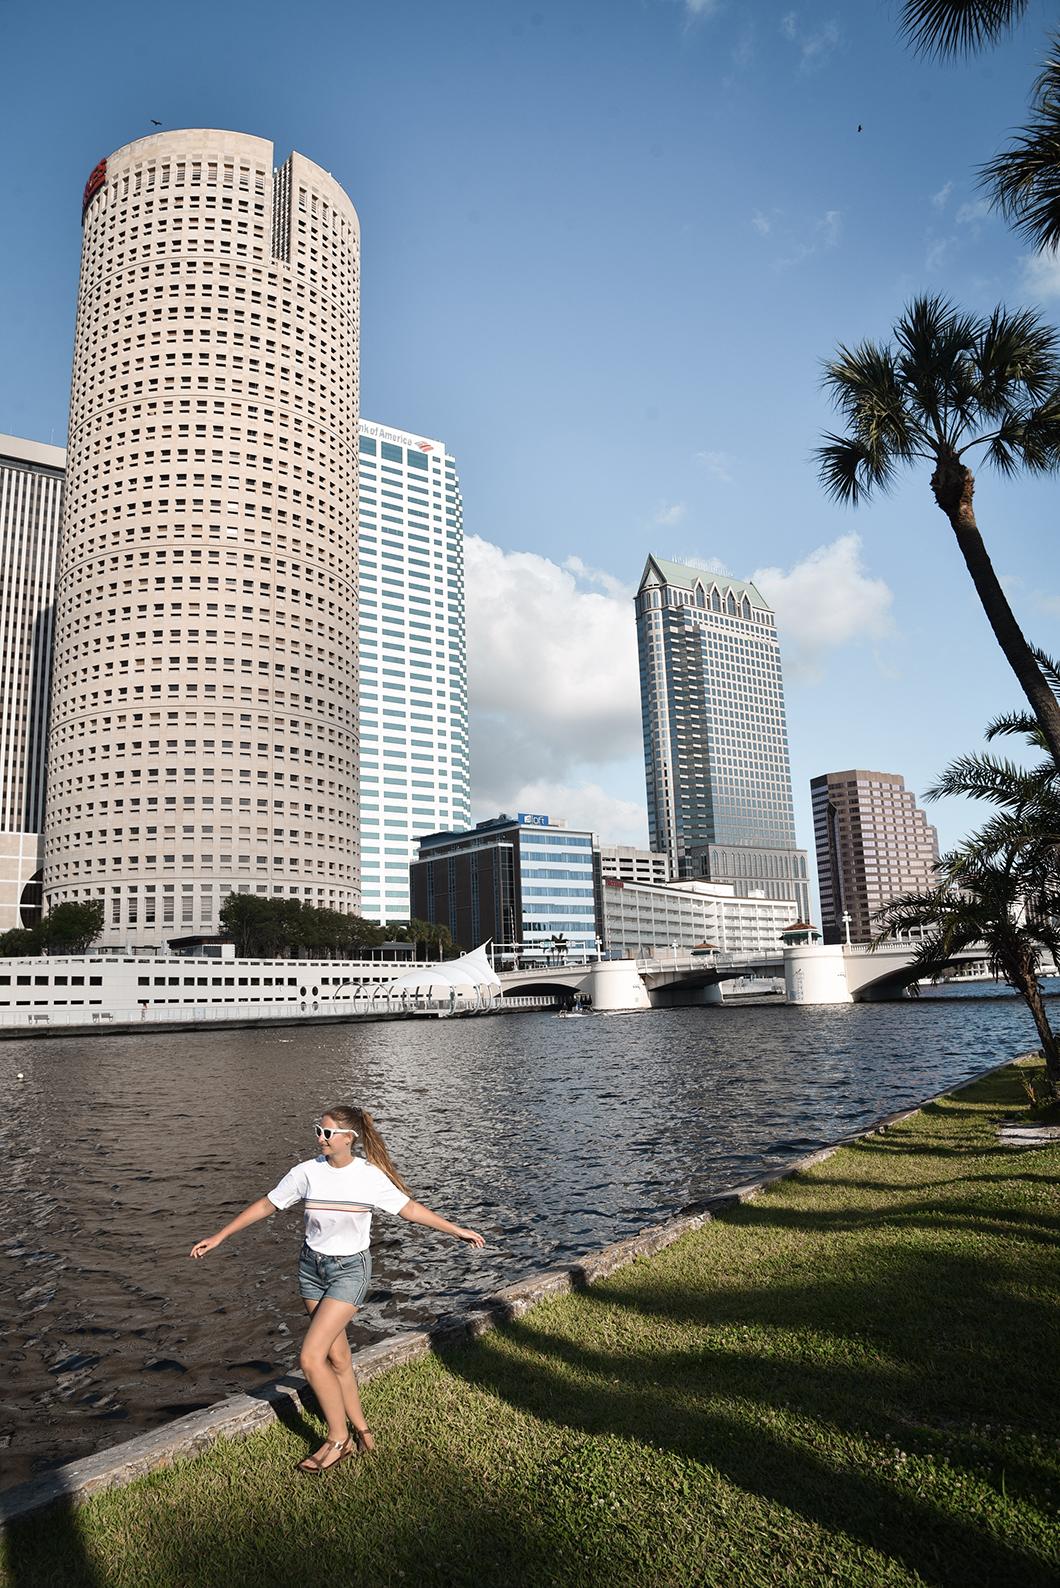 Balade au Curtis Hixon Waterfront Park à Tampa